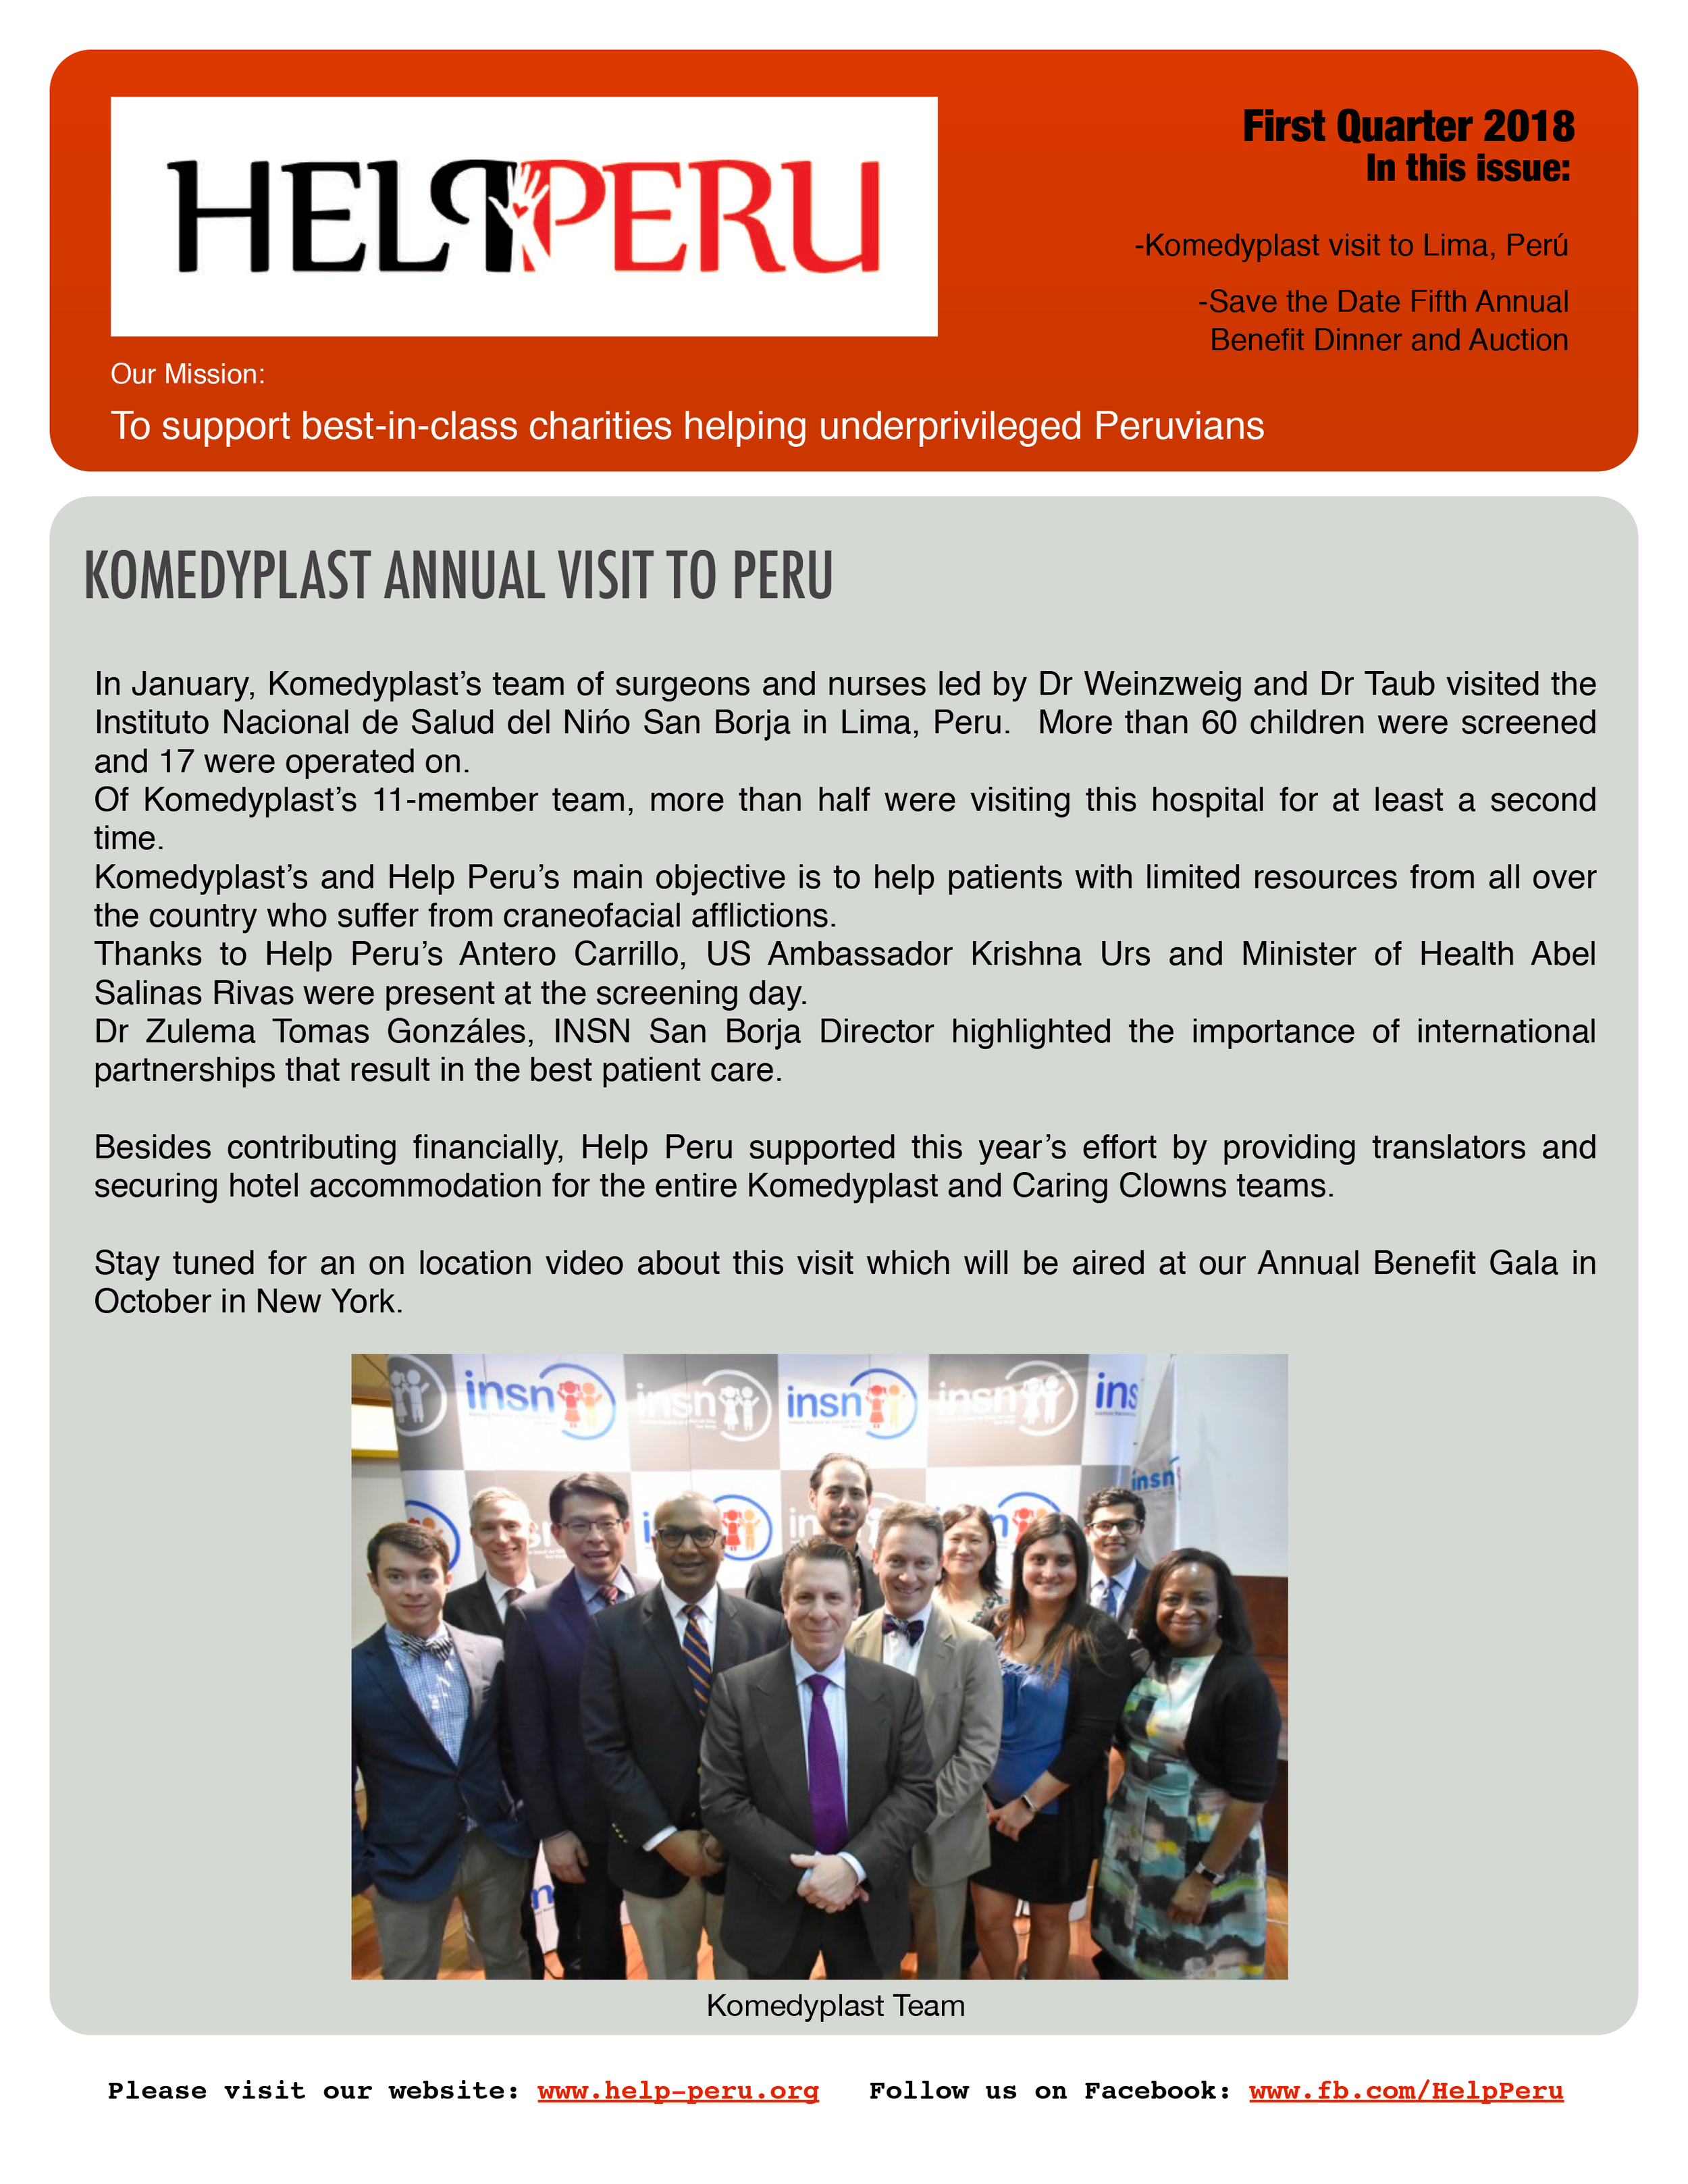 Help Peru Bulletin 1Q 2018